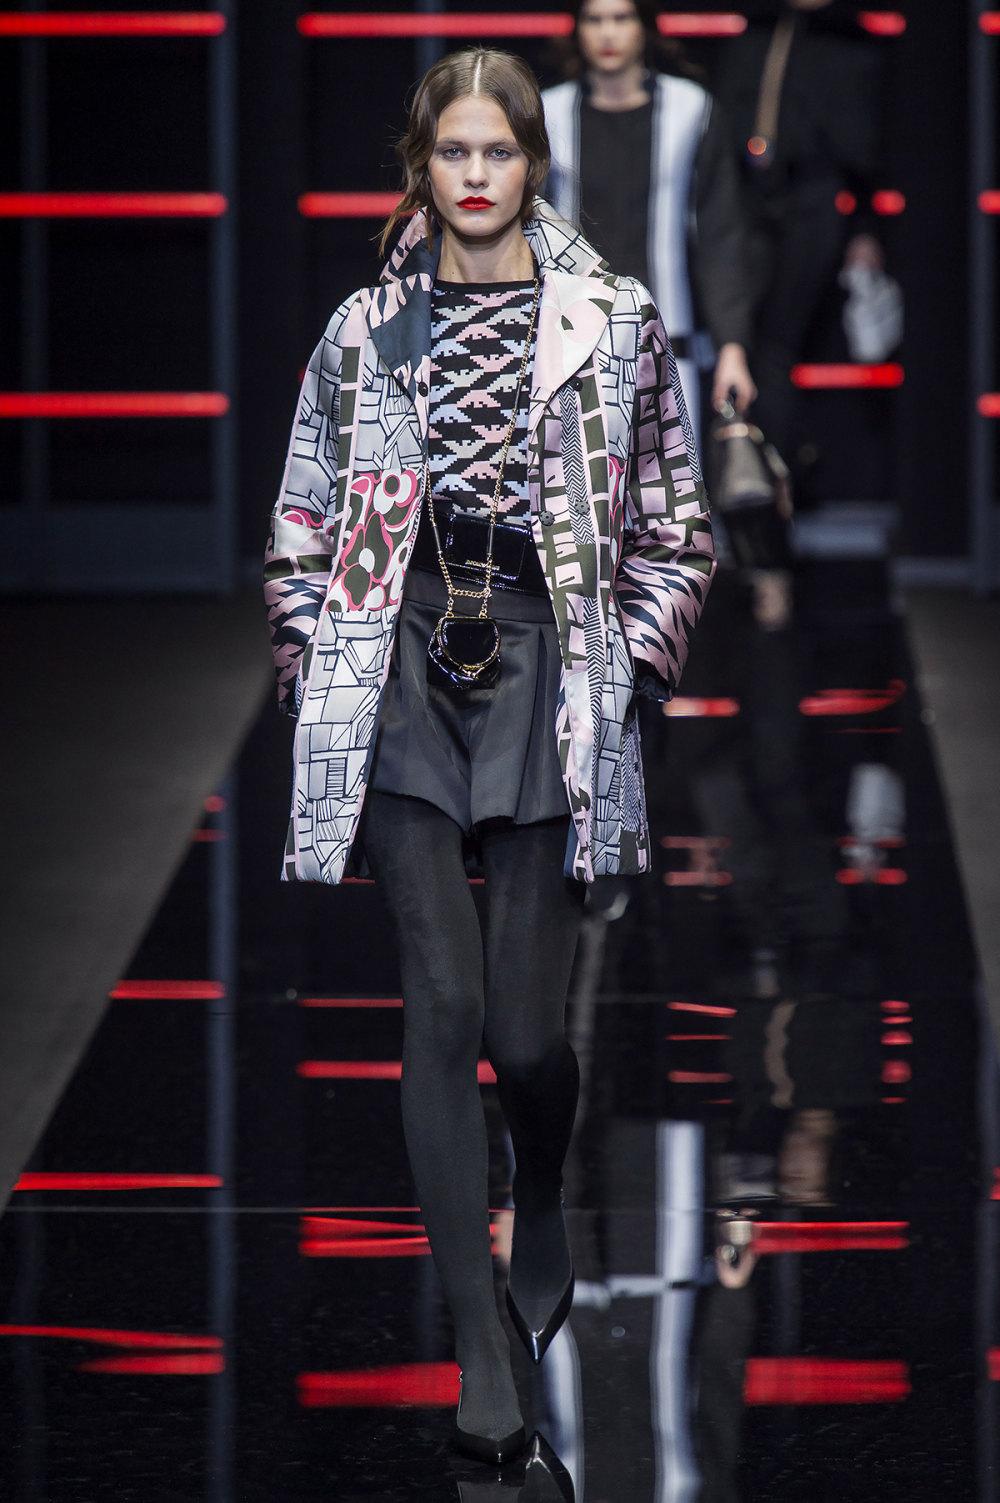 Emporio Armani时装系列畅的裤子带有柔滑裙子的鸡尾酒礼服-41.jpg